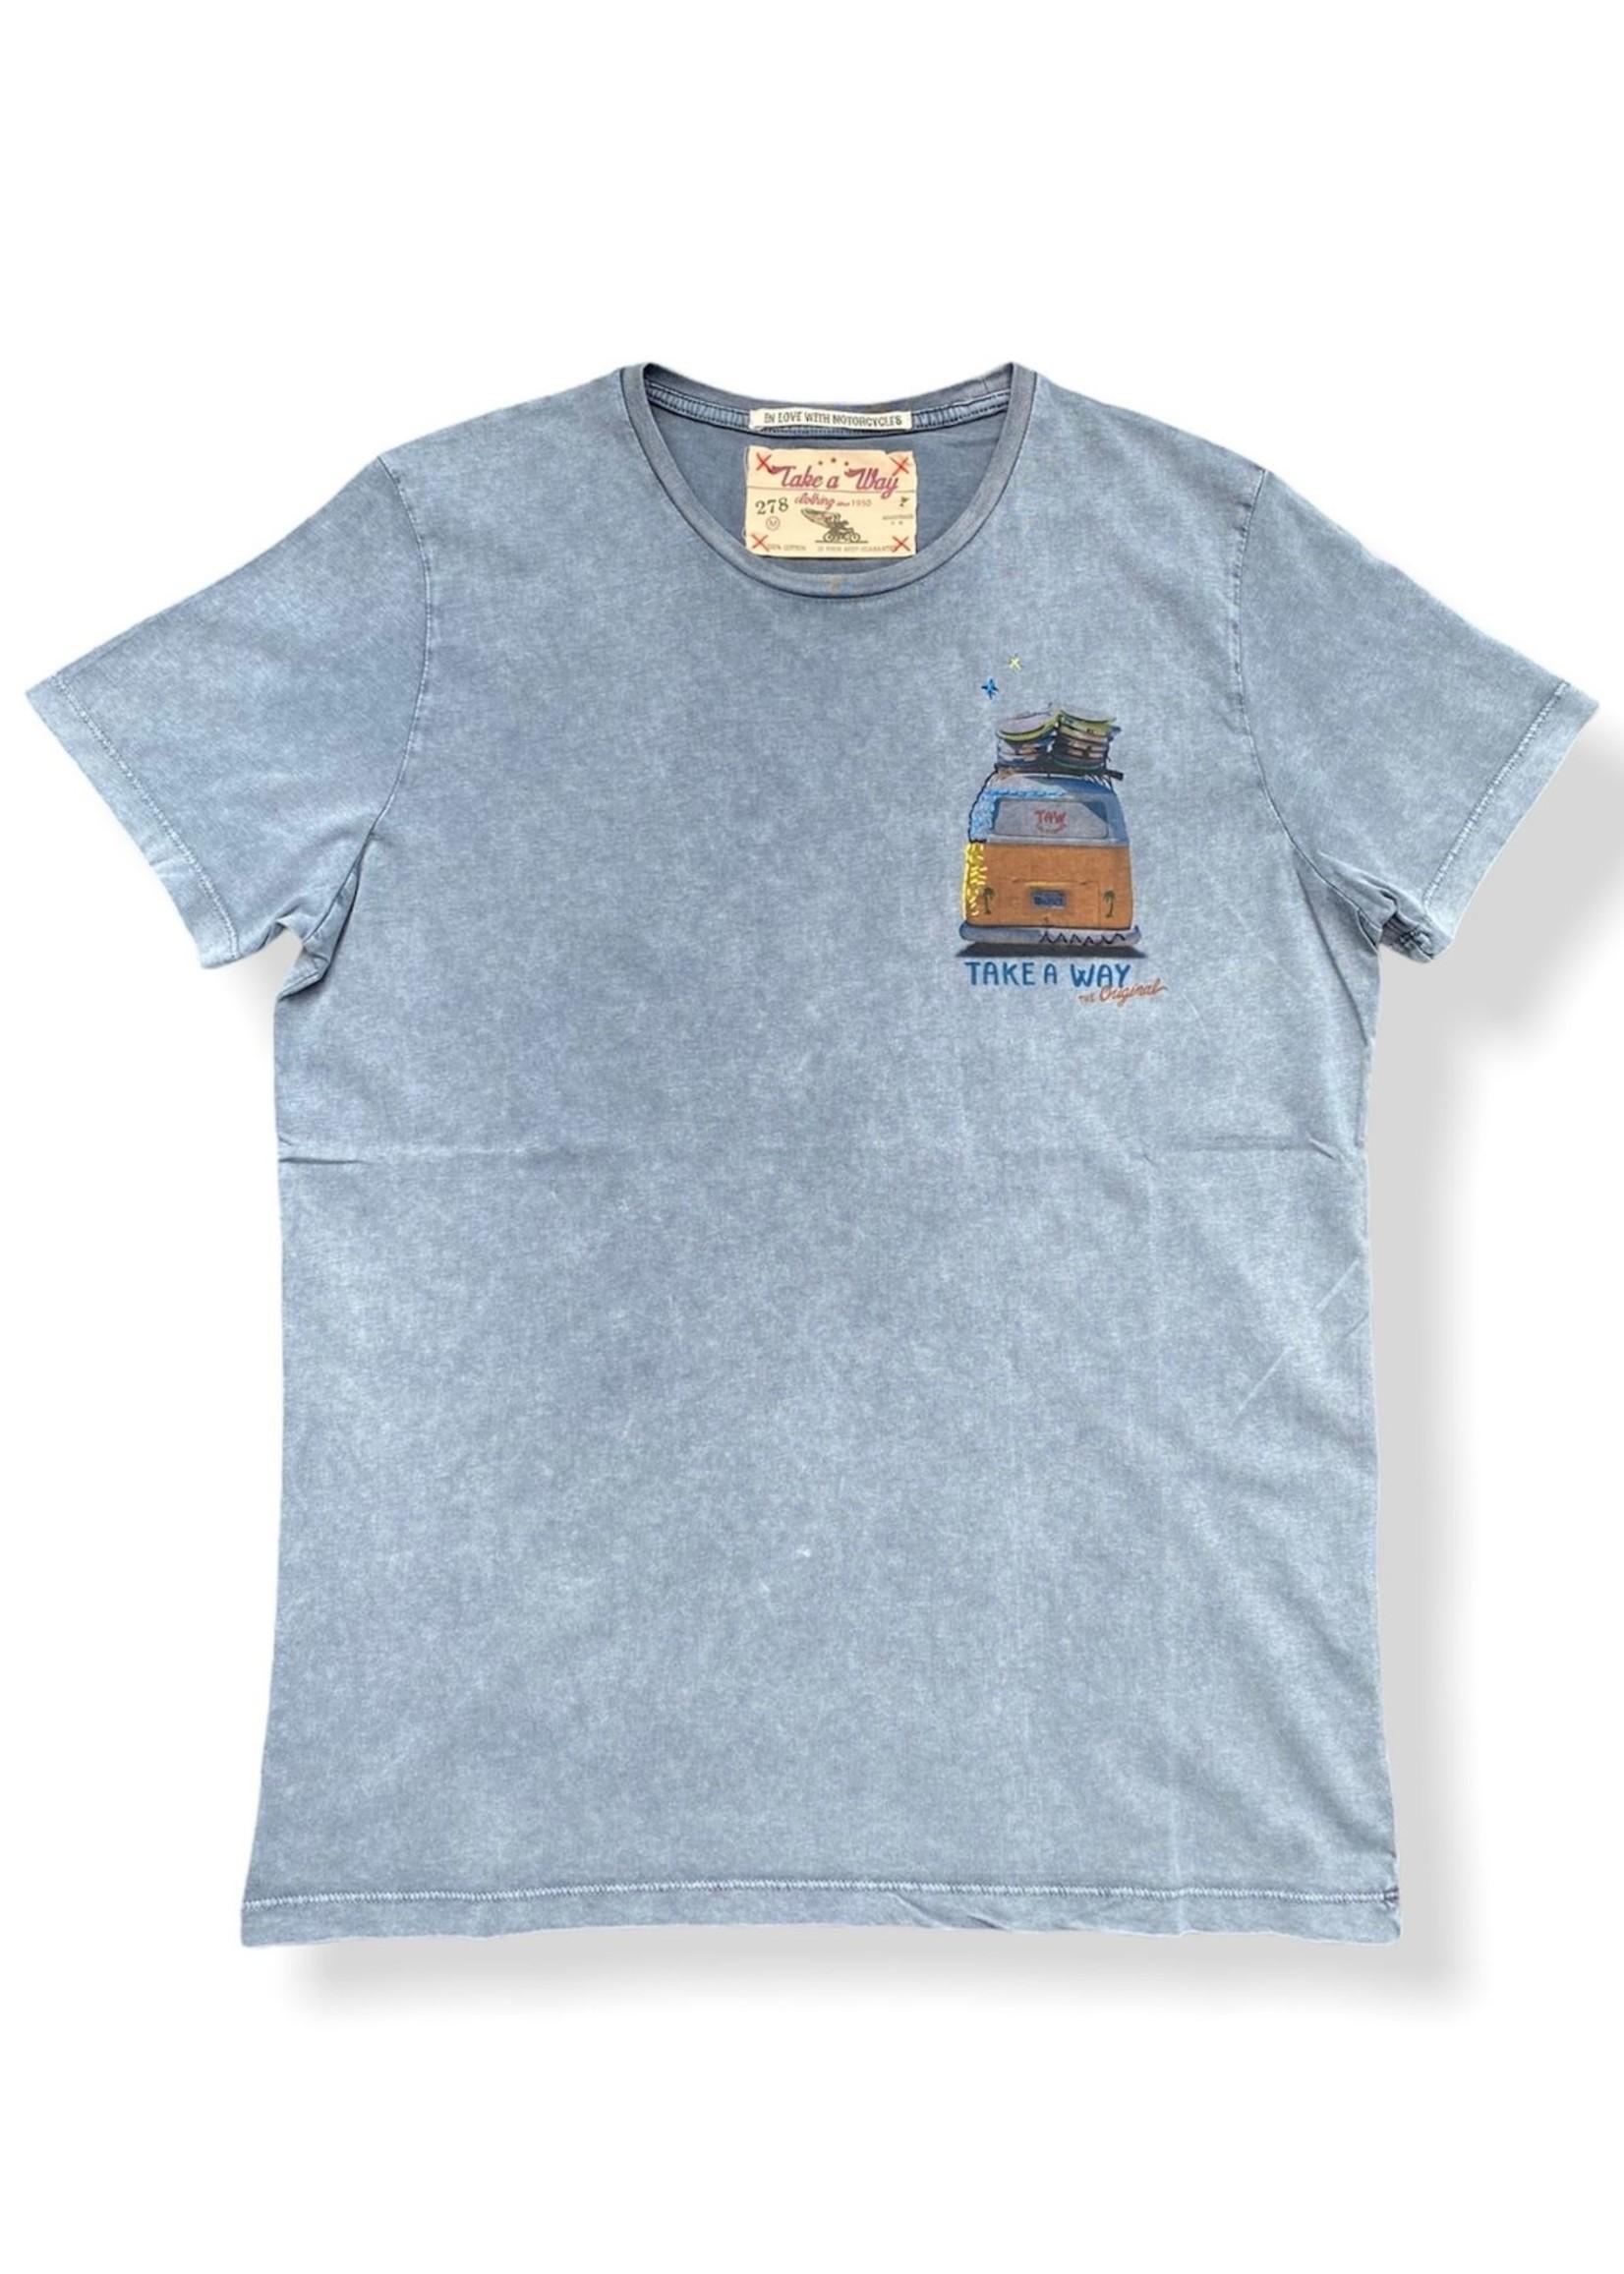 Take A Way T-Shirt Wagen | Grijs | Take a Way